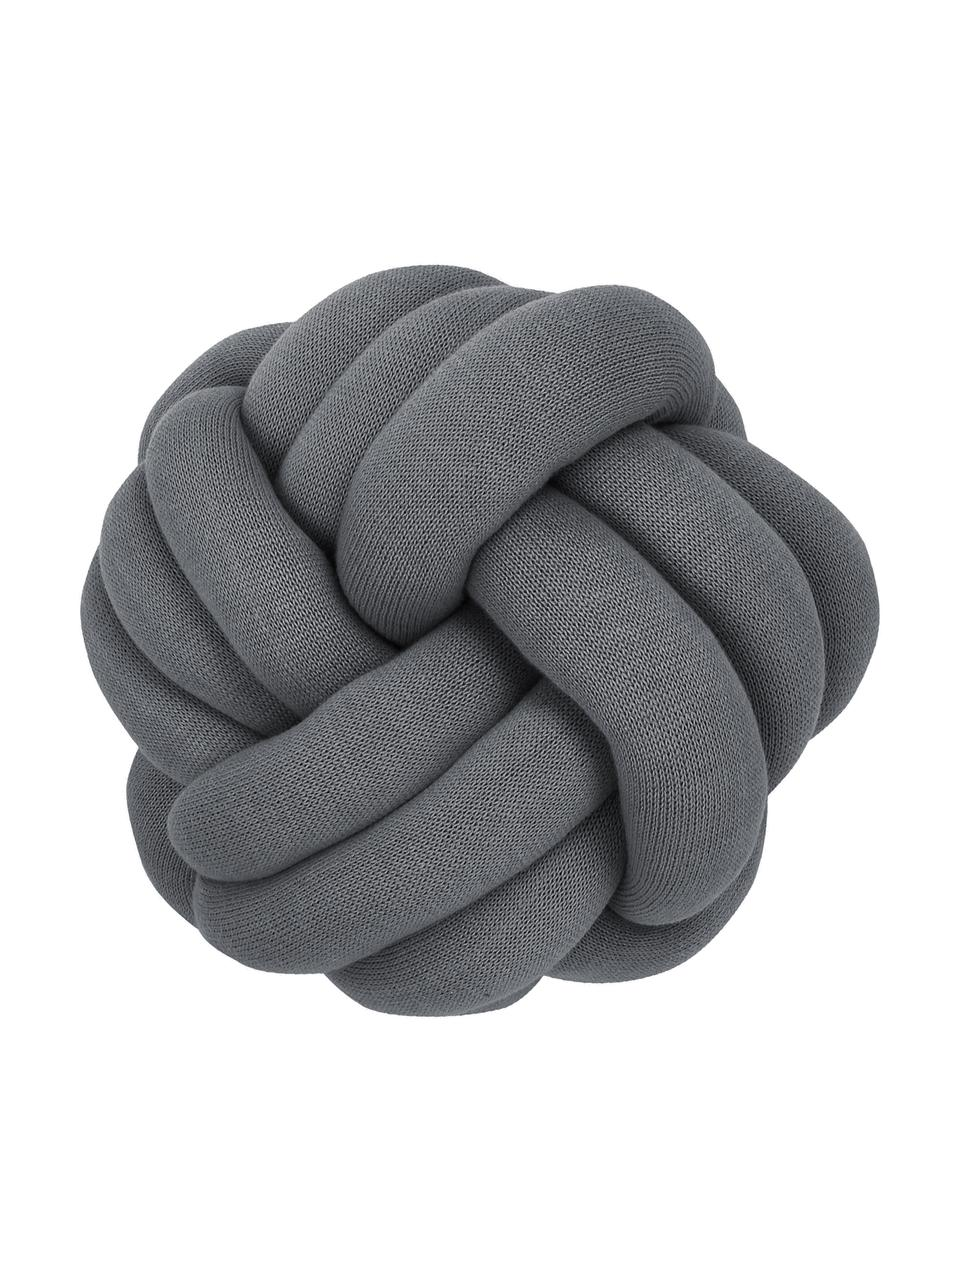 Knoten-Kissen Twist in Dunkelgrau, Dunkelgrau, Ø 30 cm